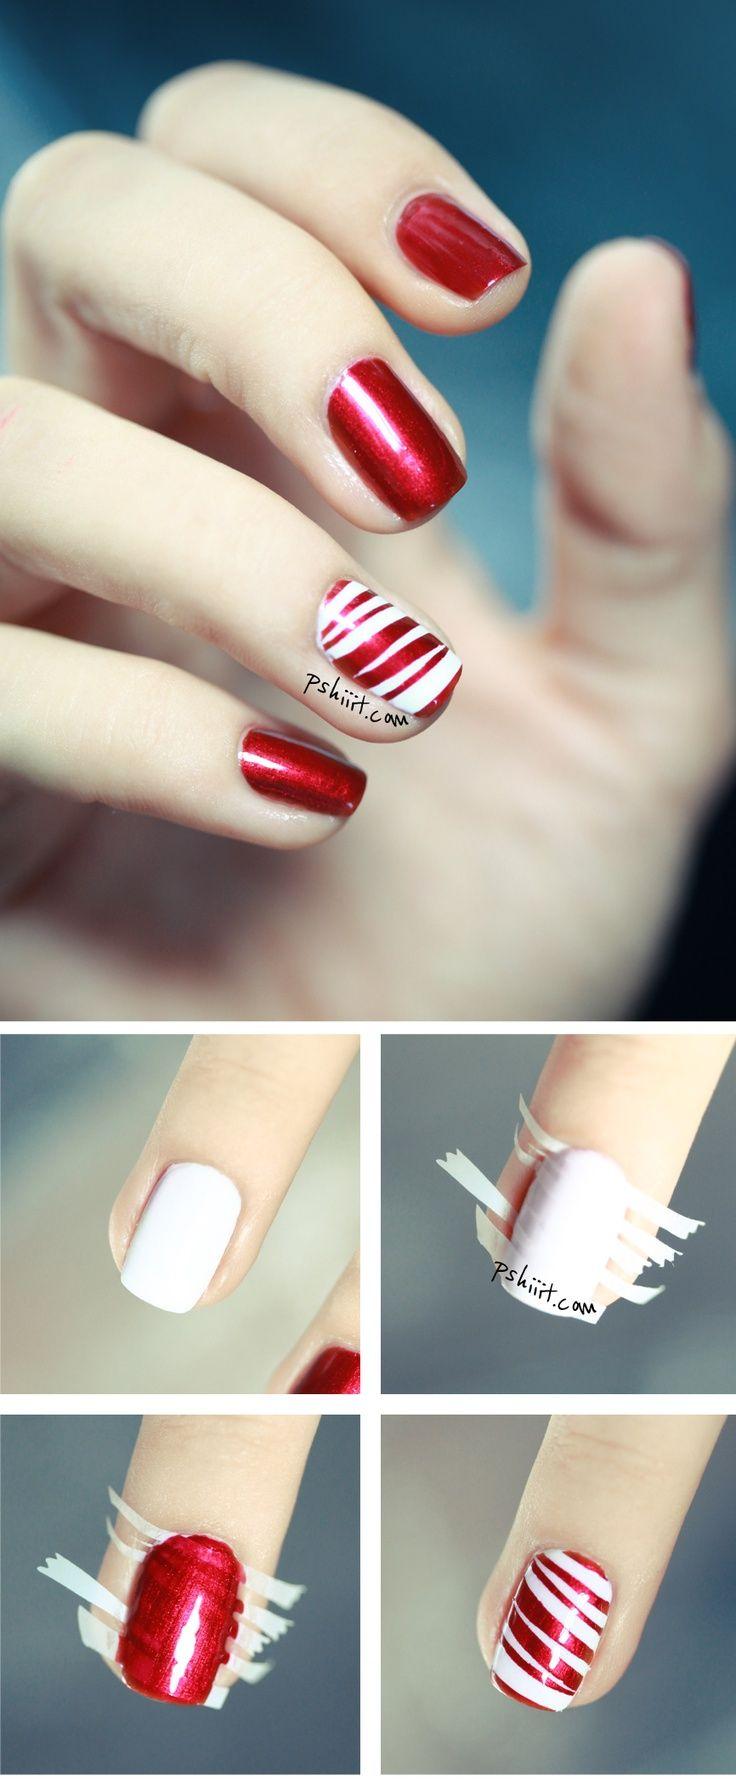 Top 10 Diy Winter Nail Art Tutorials Makeup Pinterest Nails